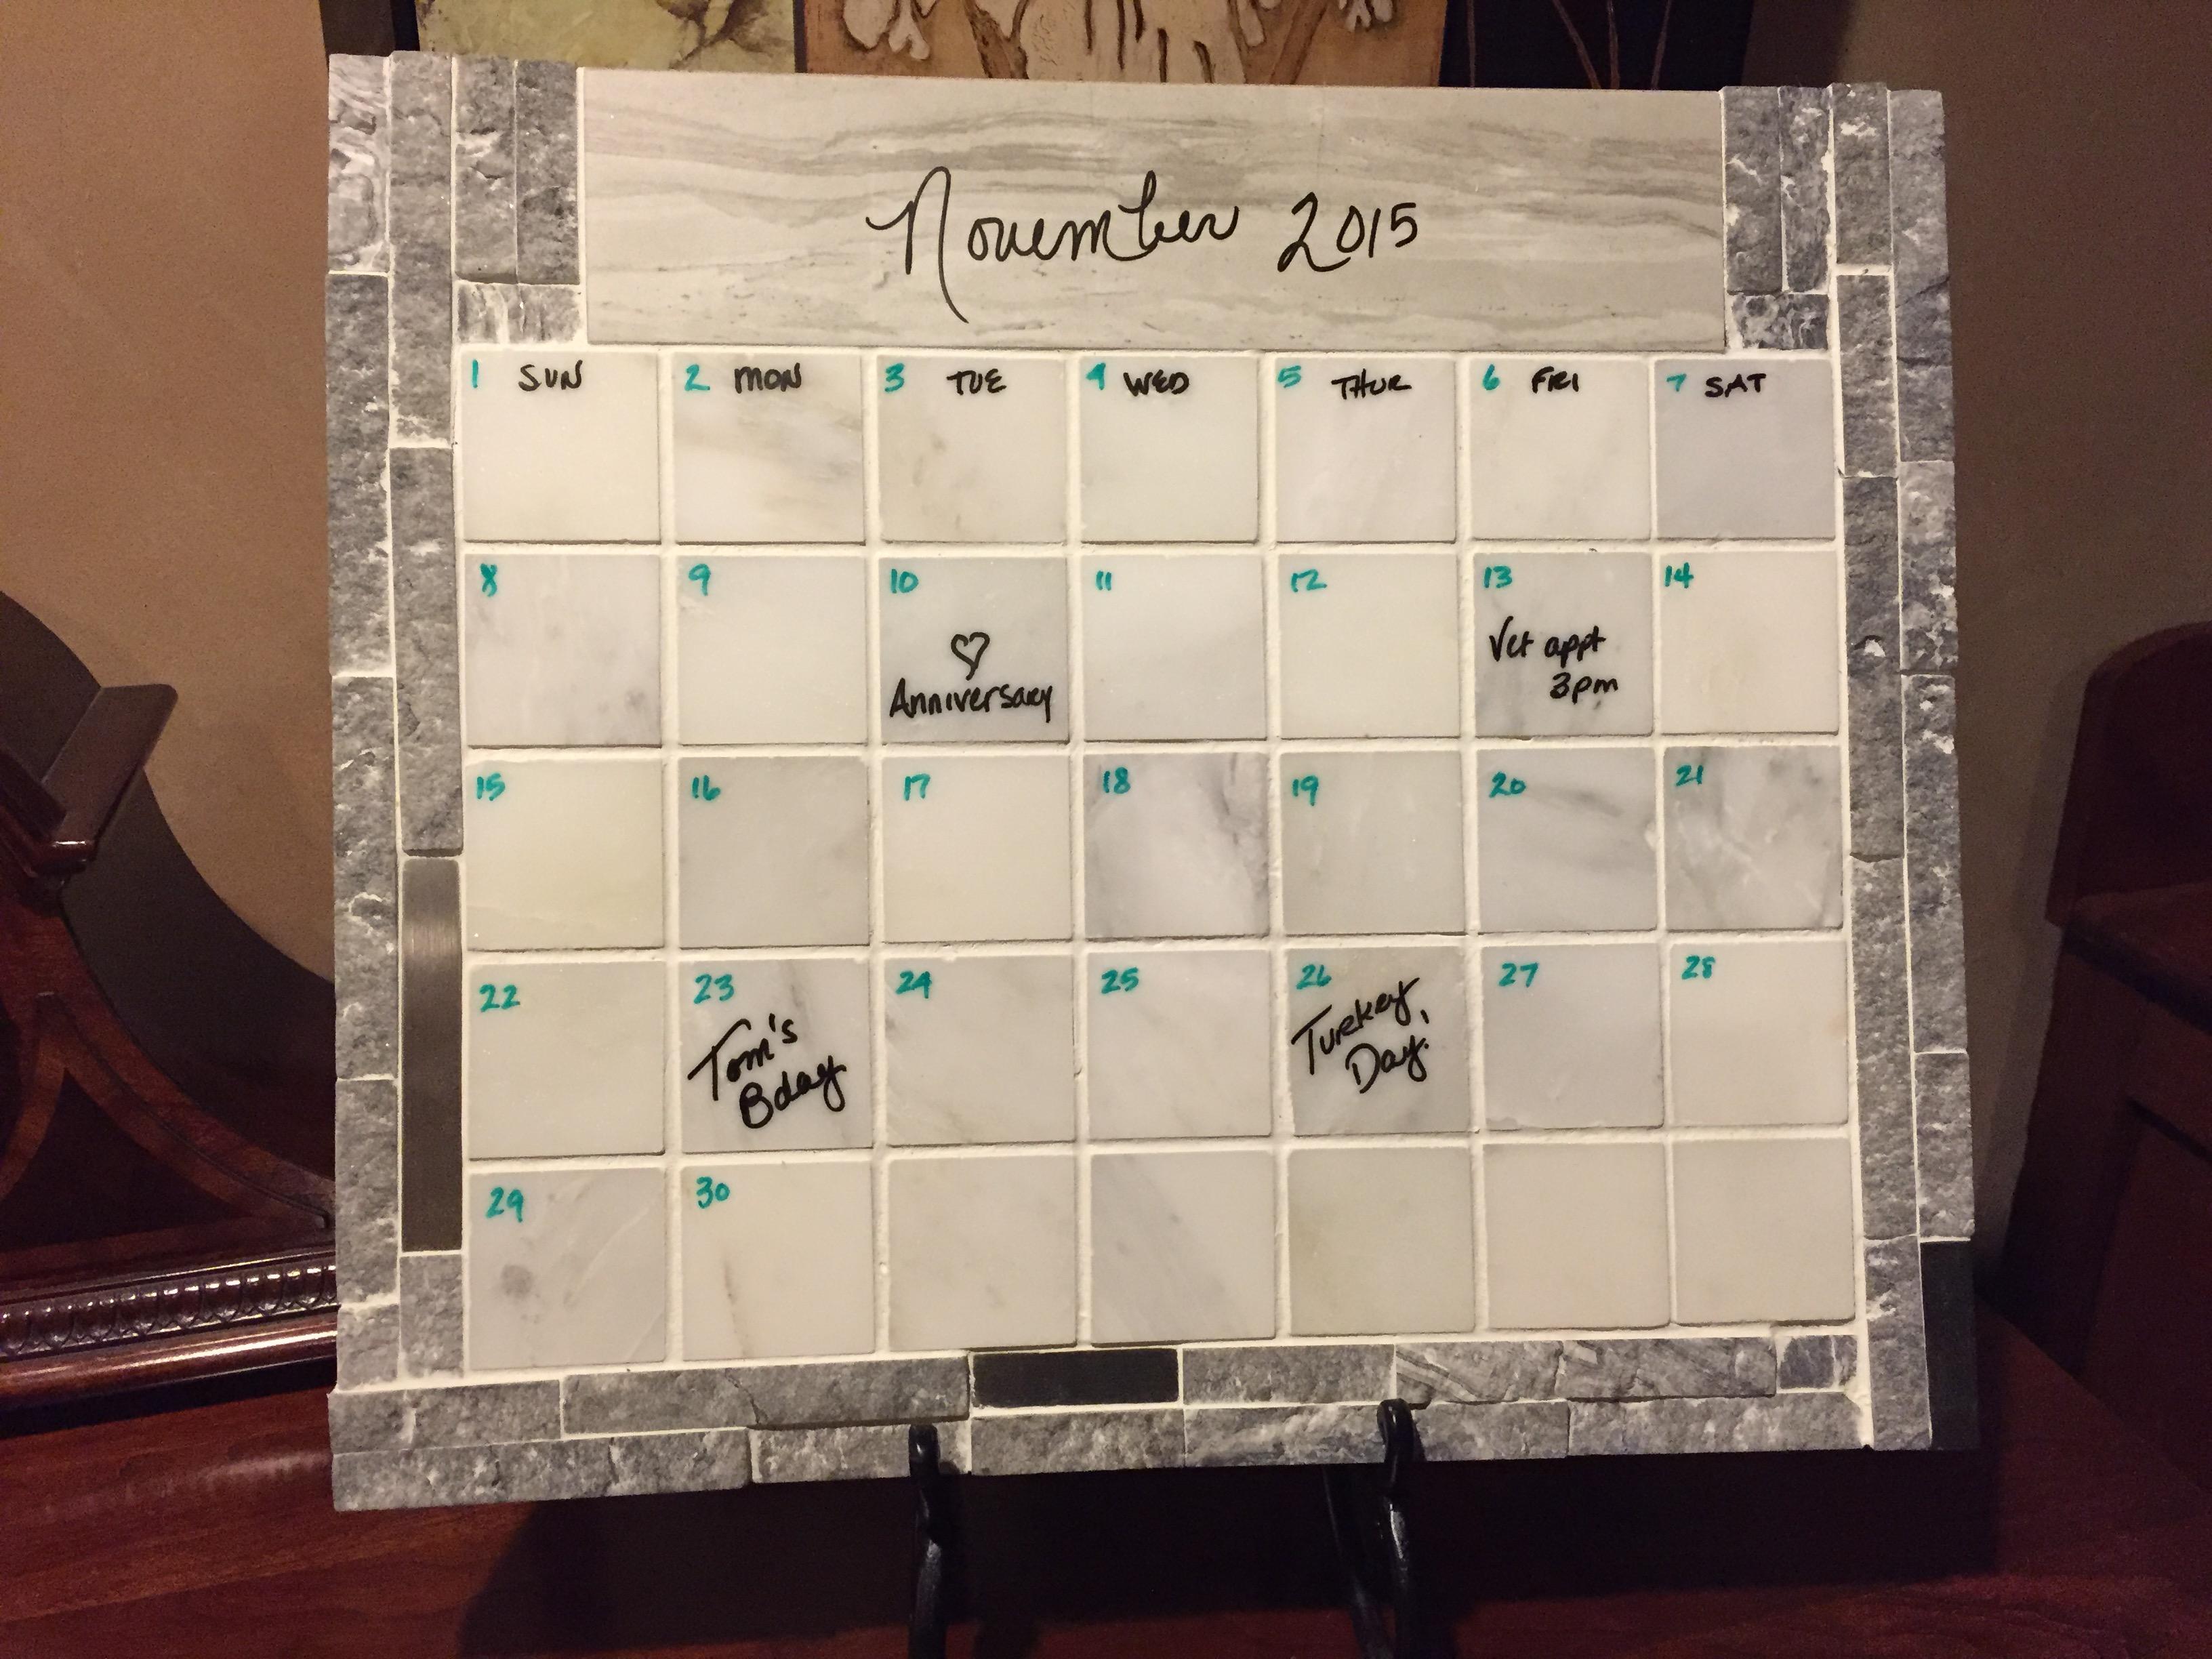 Calendar3, marble and stone calendar, dry erase